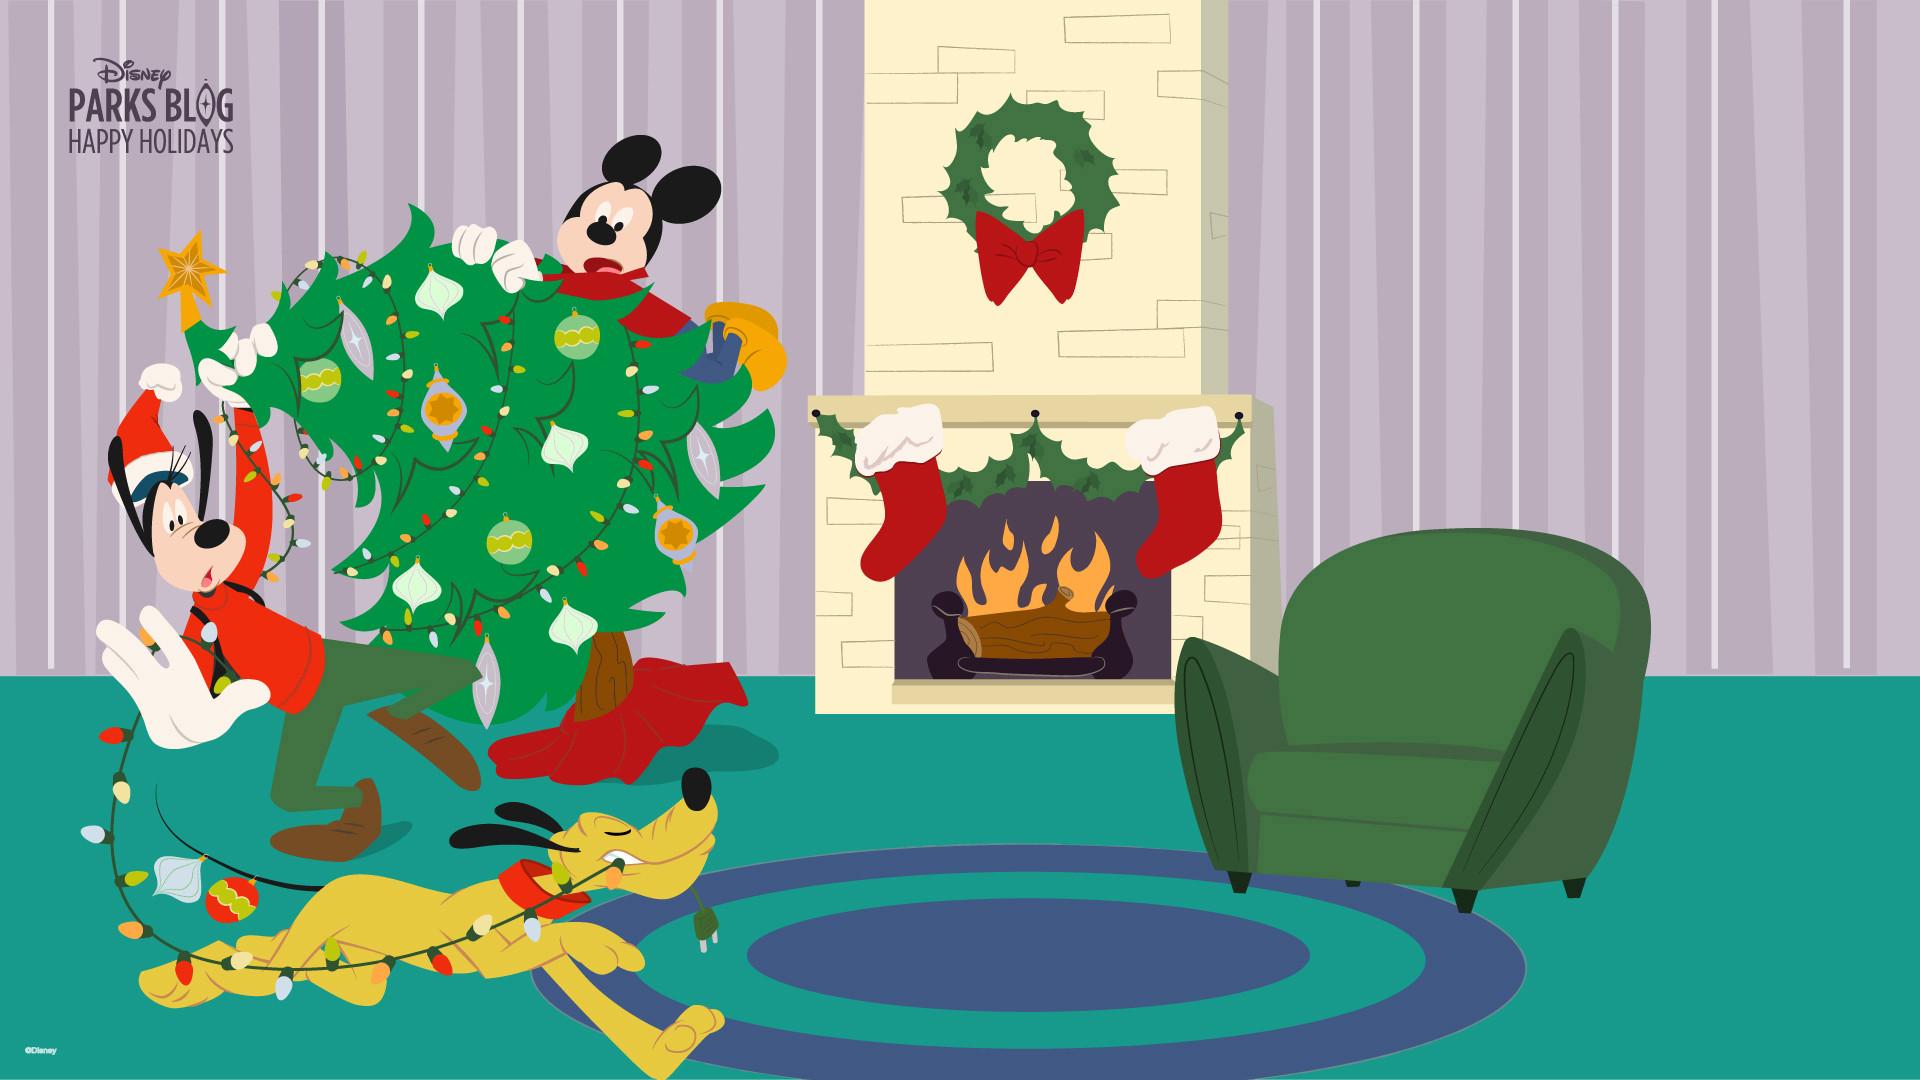 … Disney Parks Blog Holiday Wallpaper